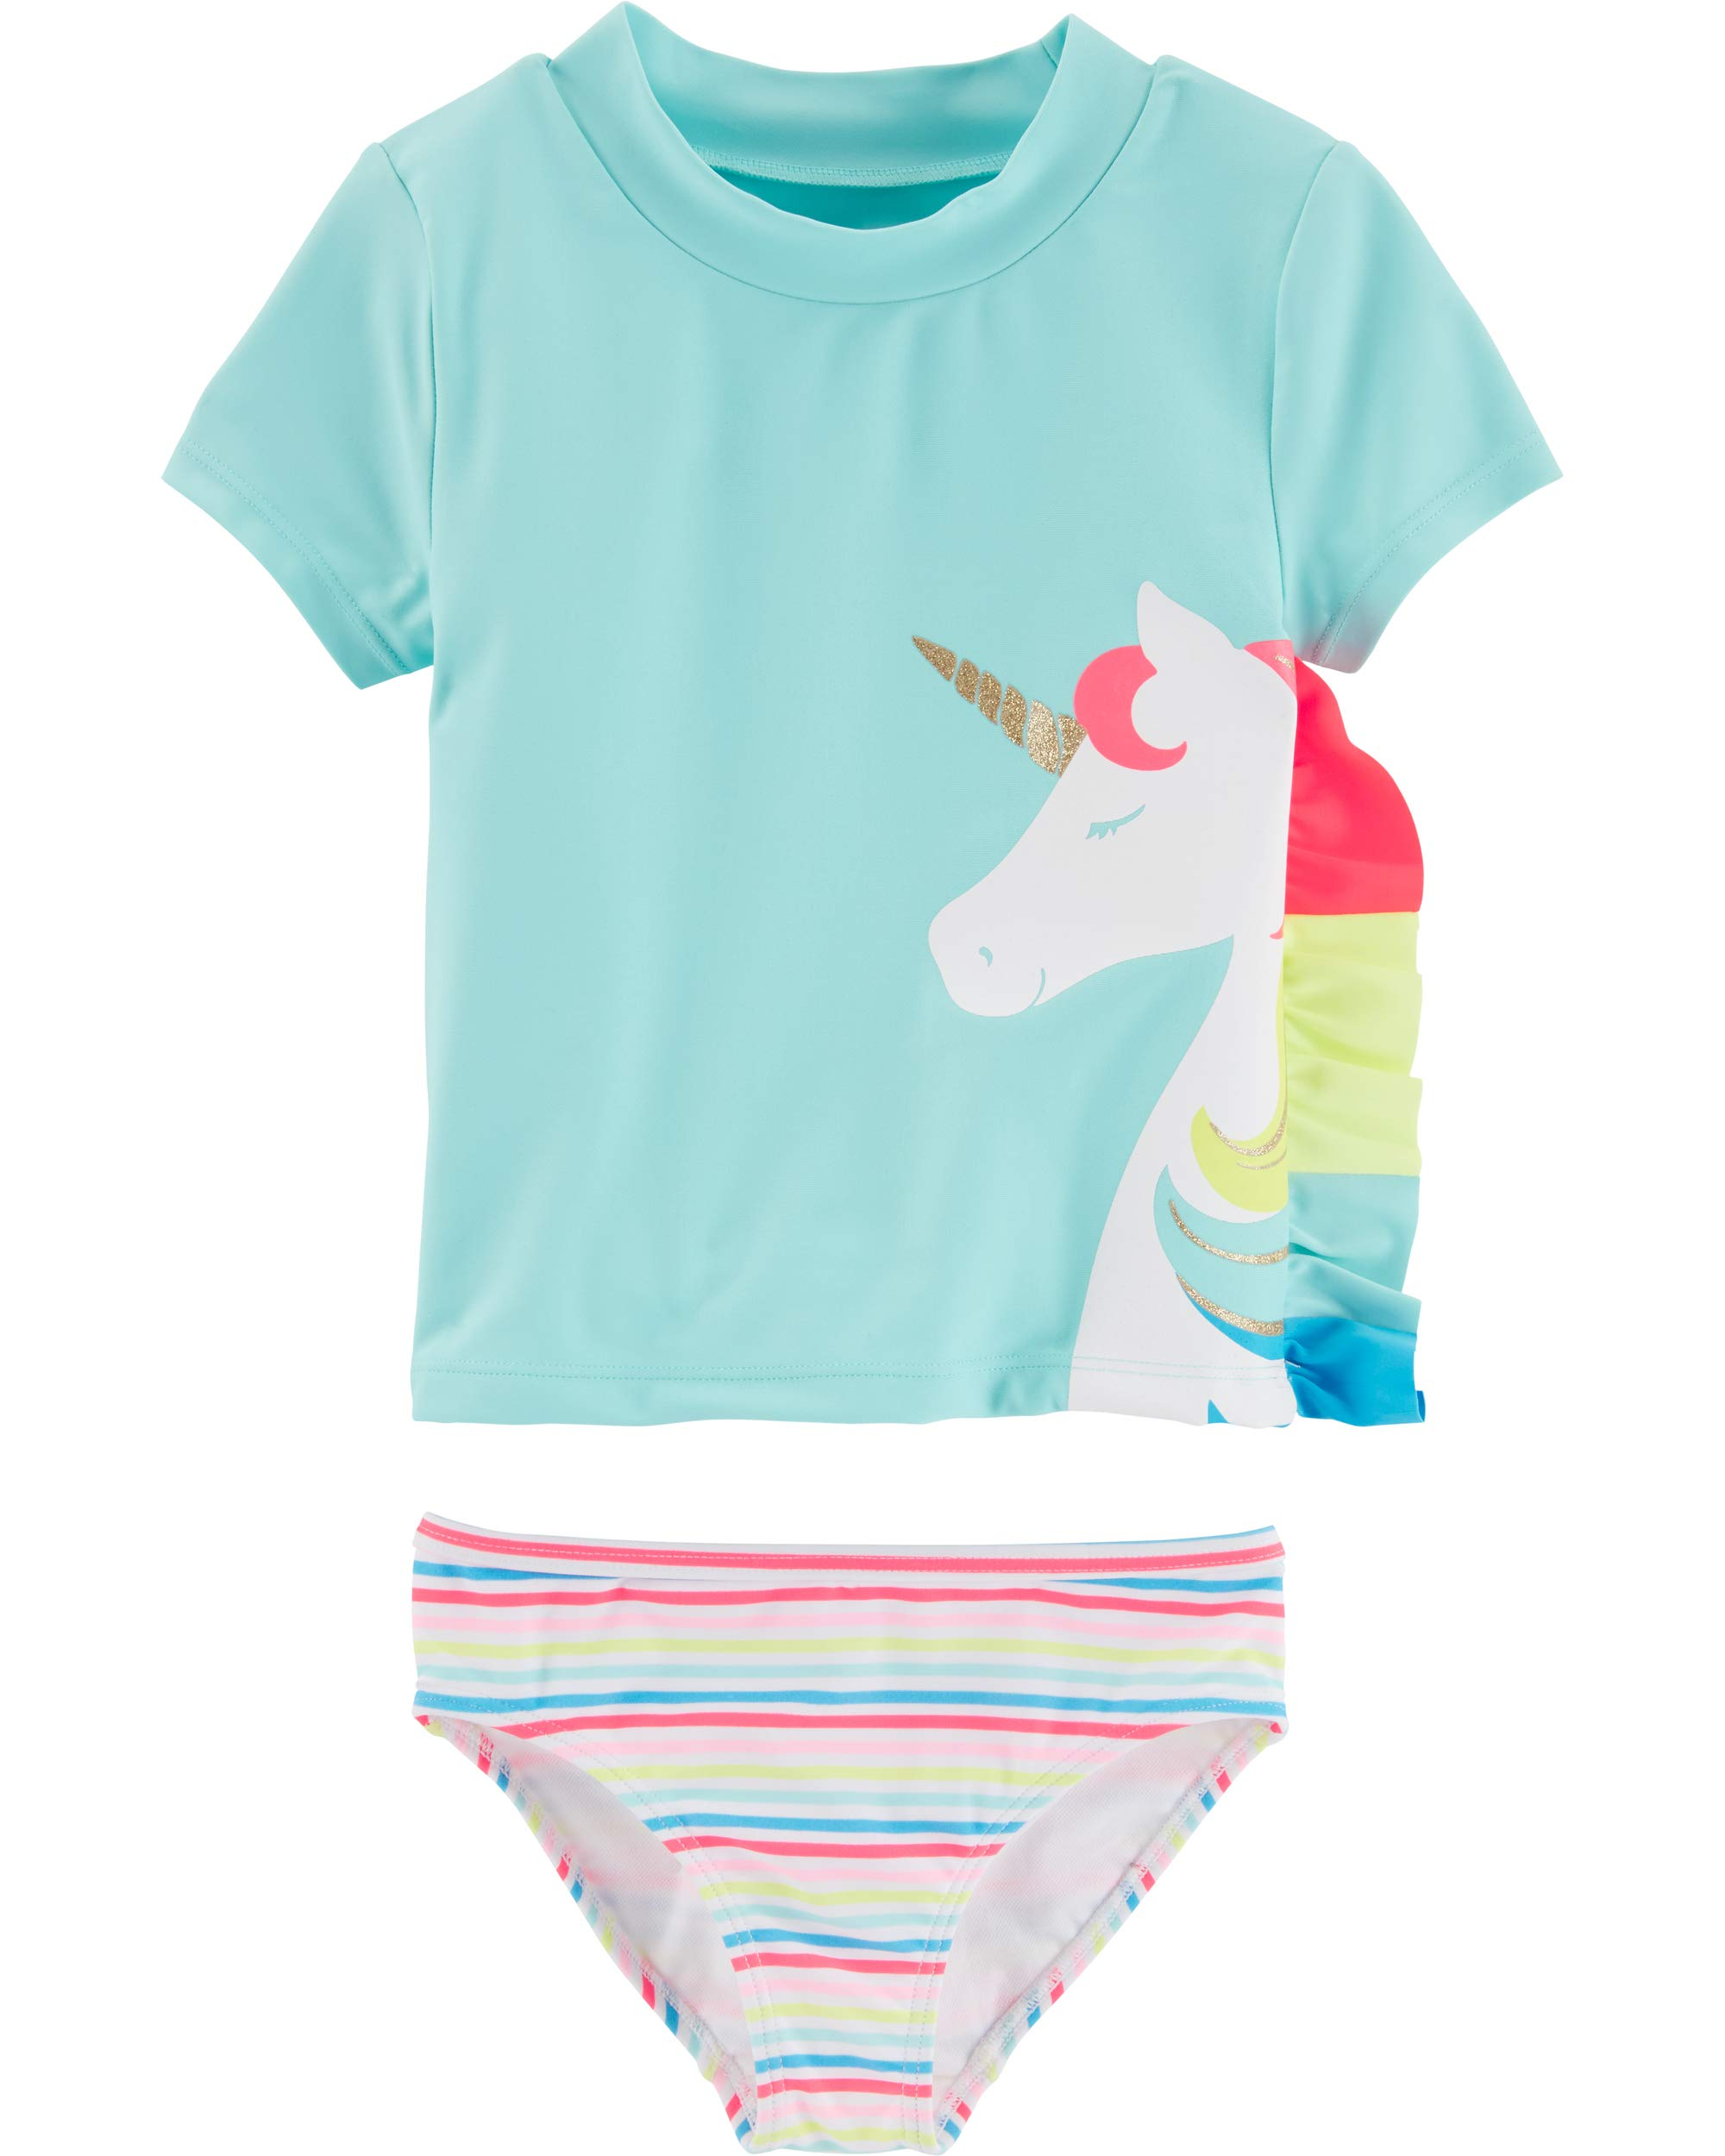 Sun Protection Two-Piece Swimwear Green 4T PHIBEE Girls Short Sleeve Rash Guard Set UPF 50